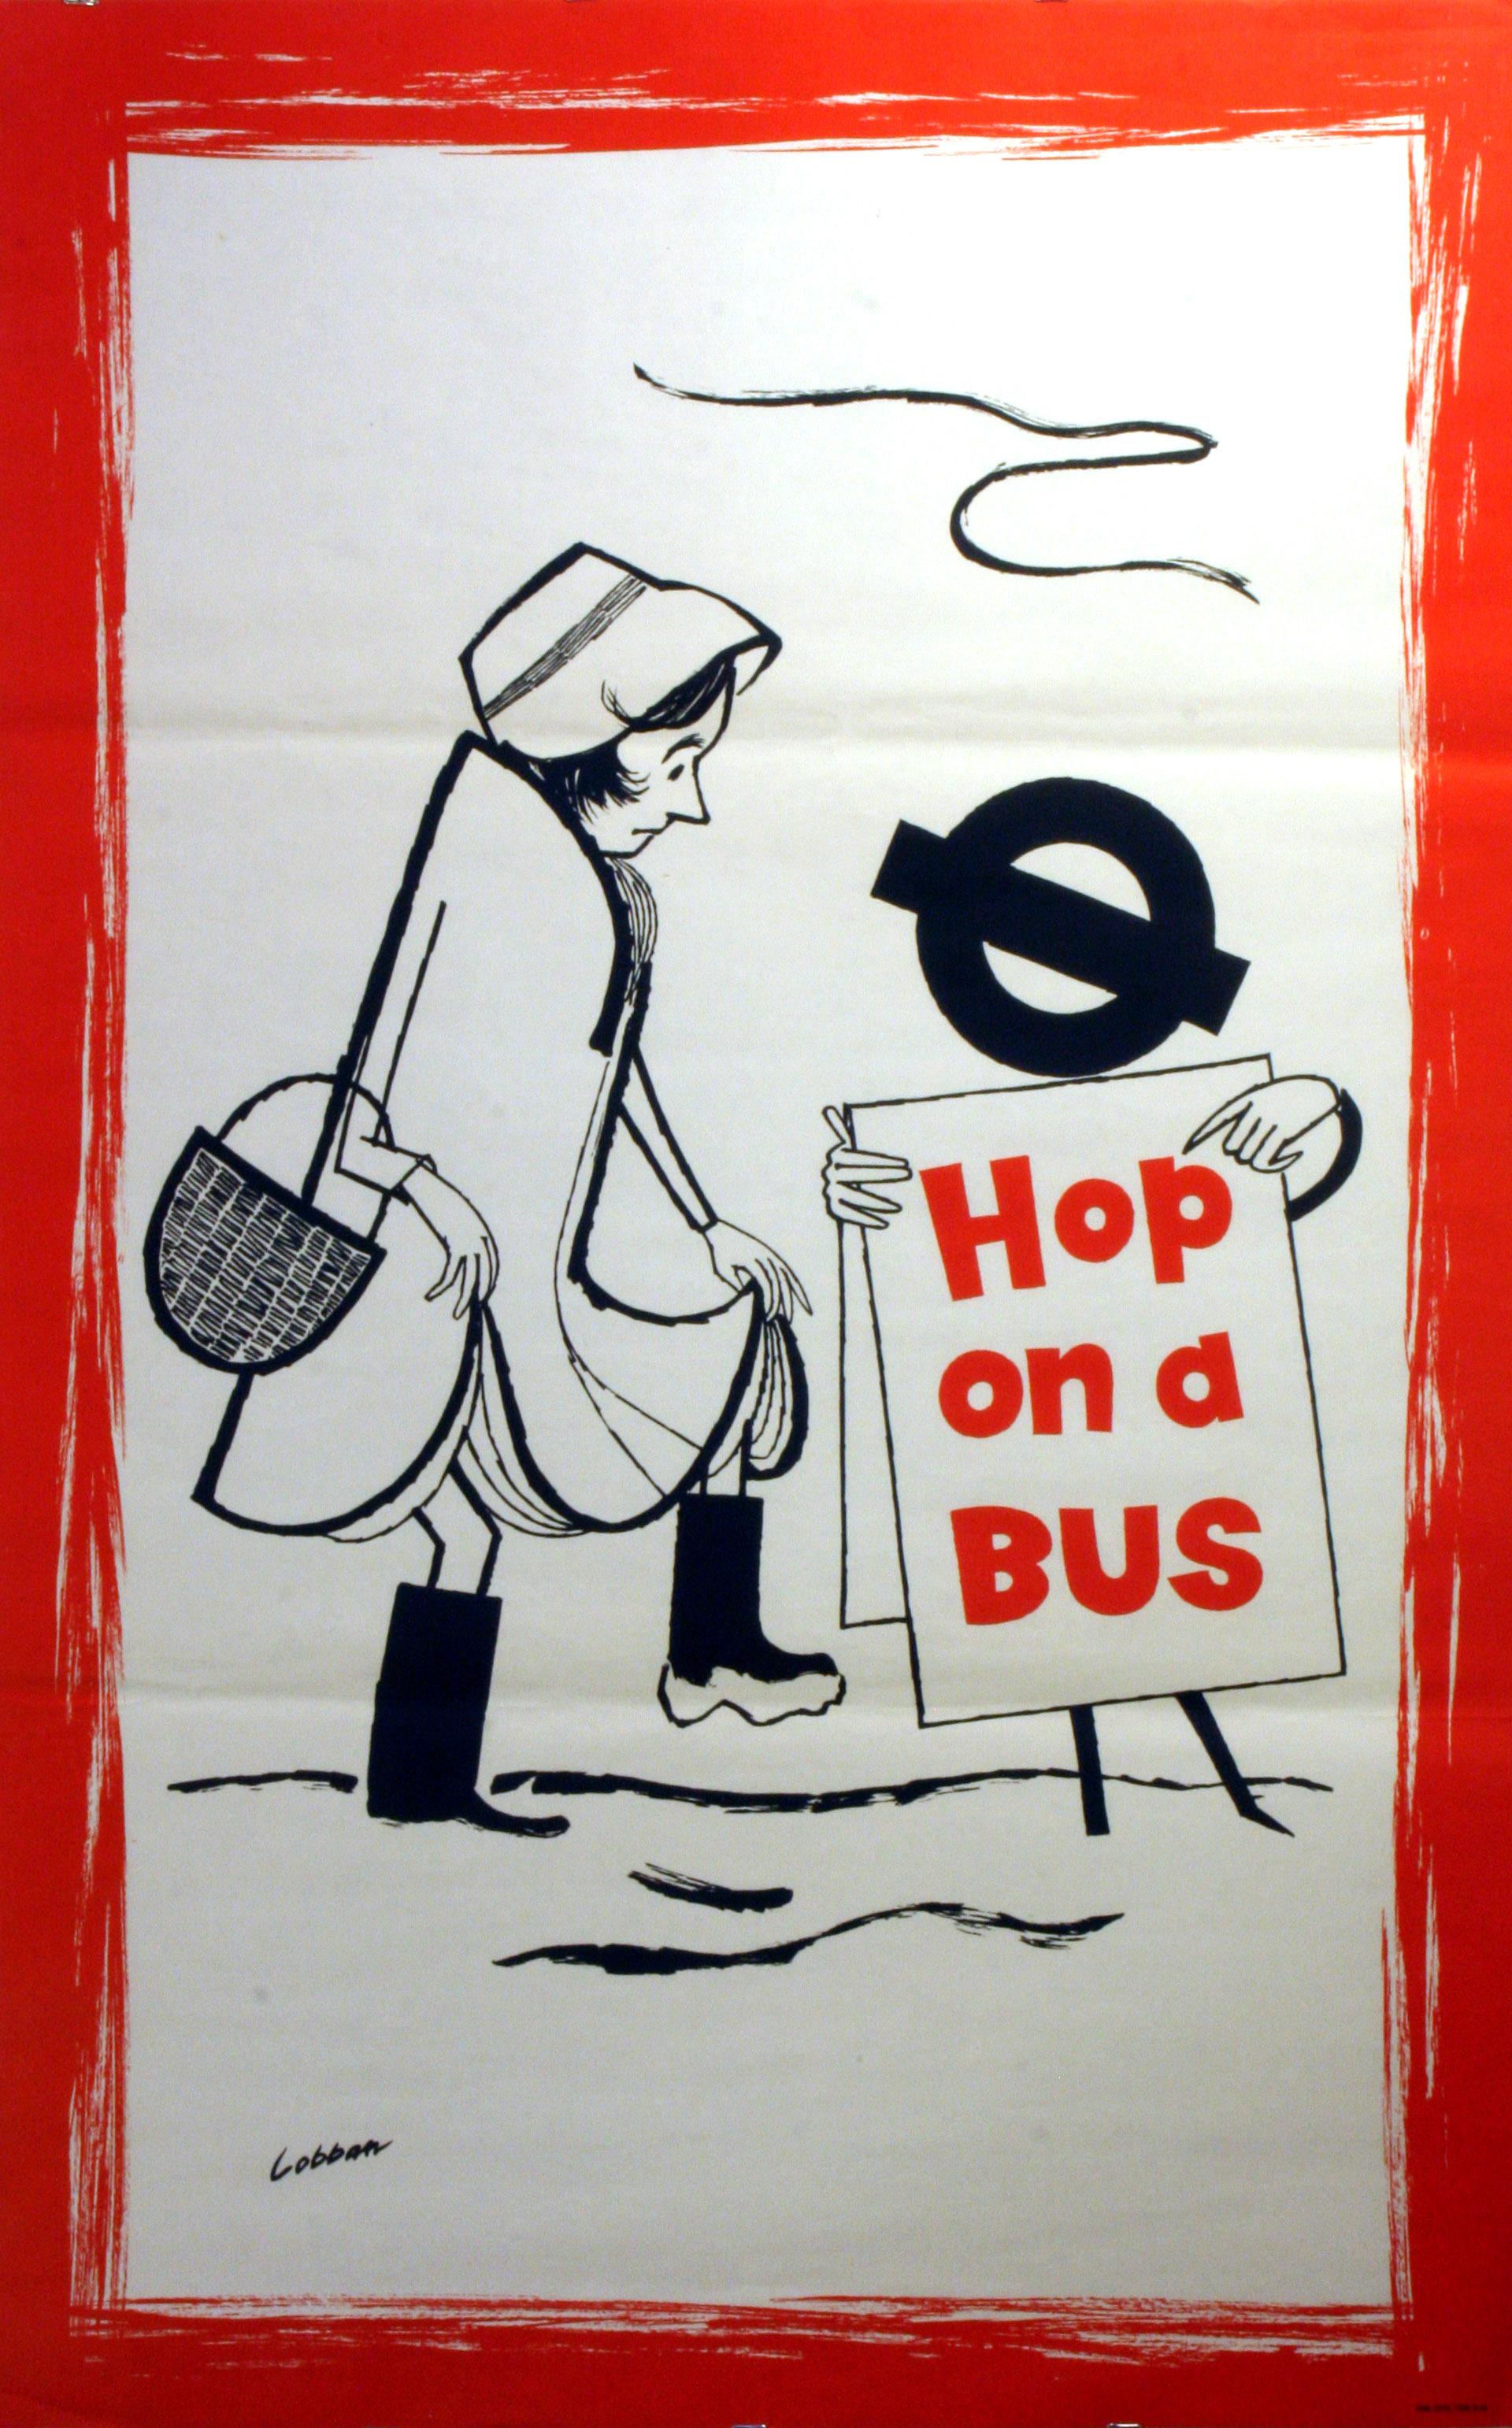 Lot 1507 - Original Vintage Advertising Poster LT London Transport: Hop on a Bus - snow